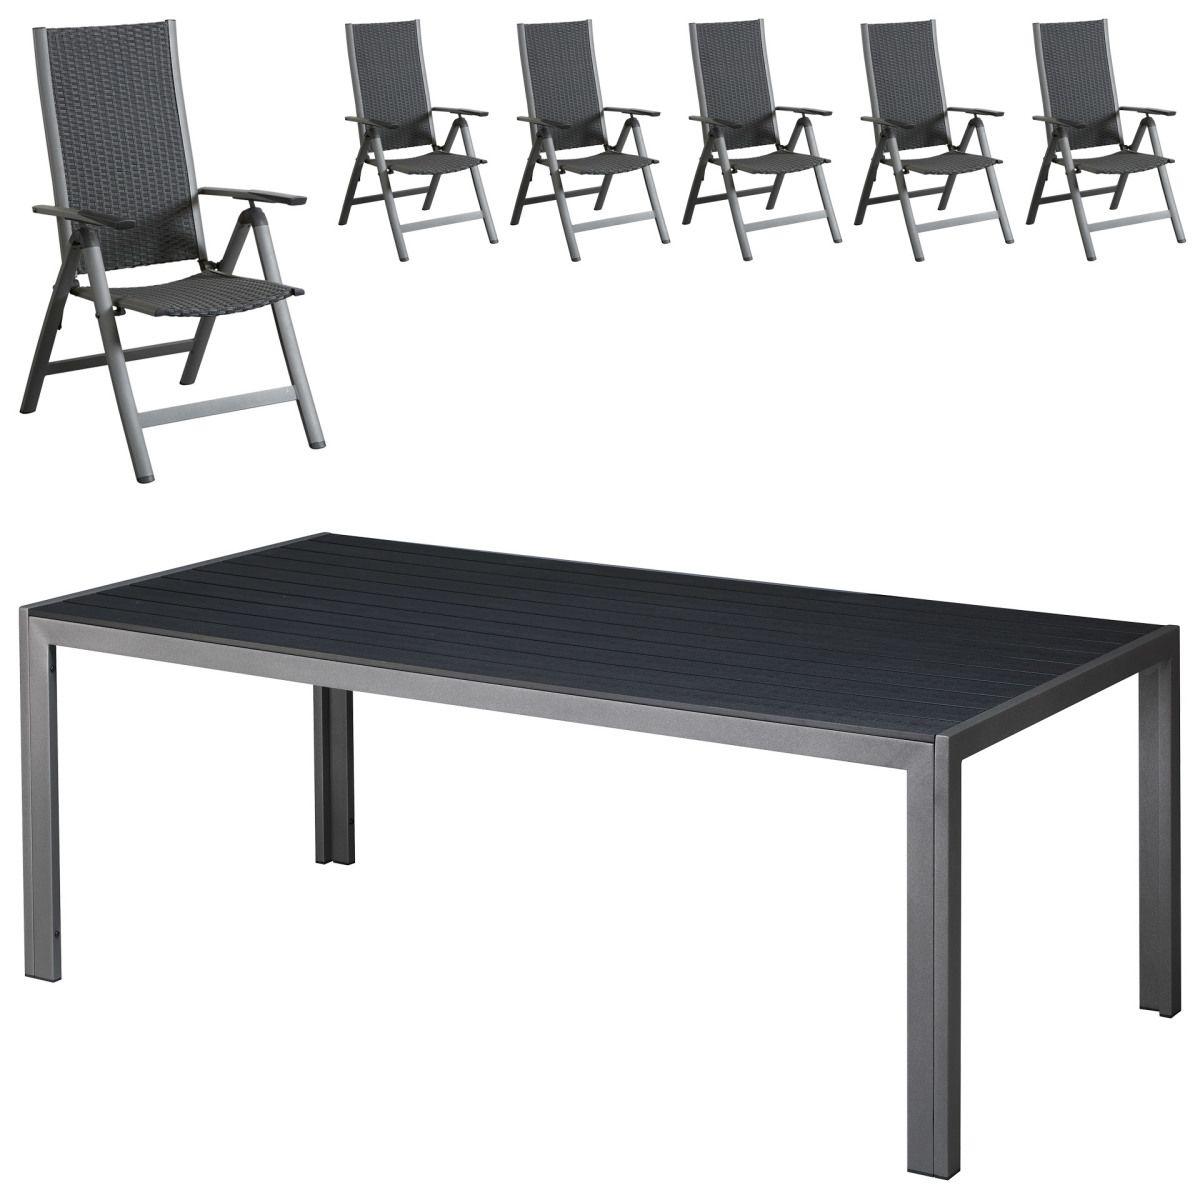 Gartenmöbel Set Las Vegas/Pasadena (100x205, 6 Stühle, schwarz